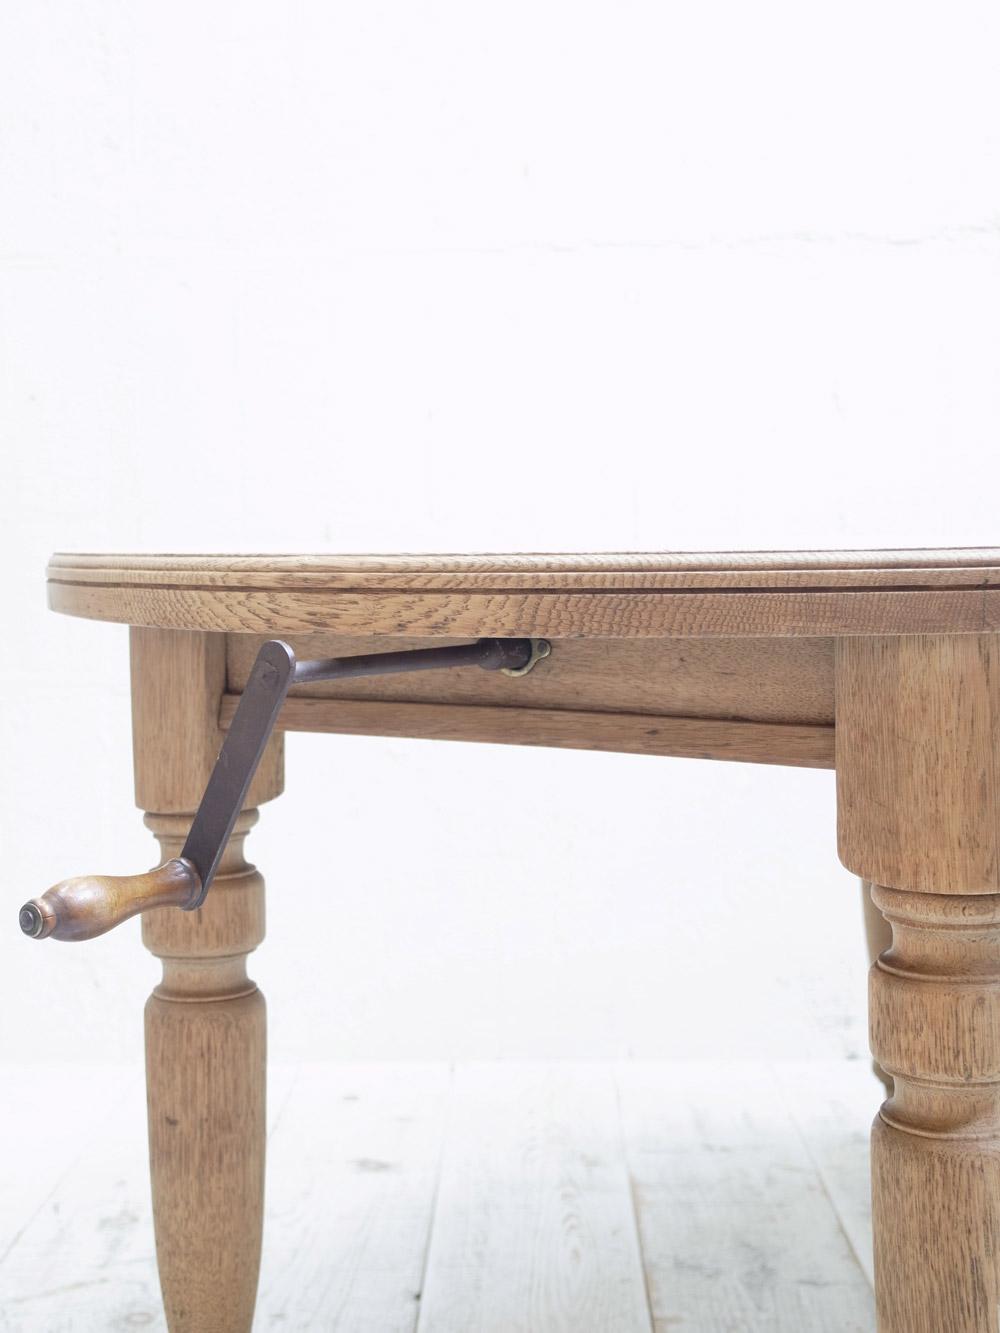 PJ1171 アンティーク オークエクステンションテーブル